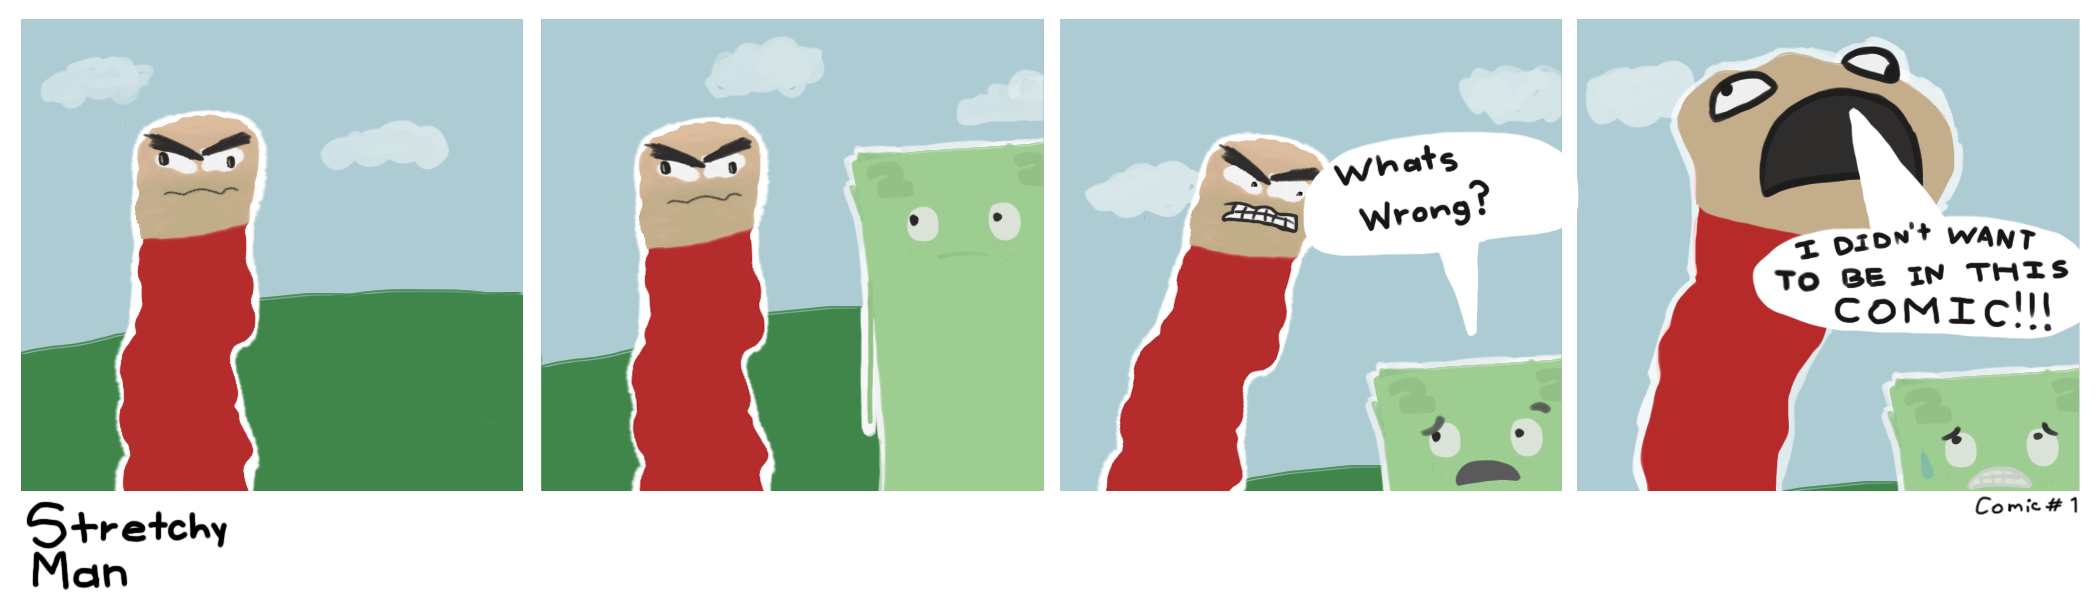 Stretchy Man Comic #1